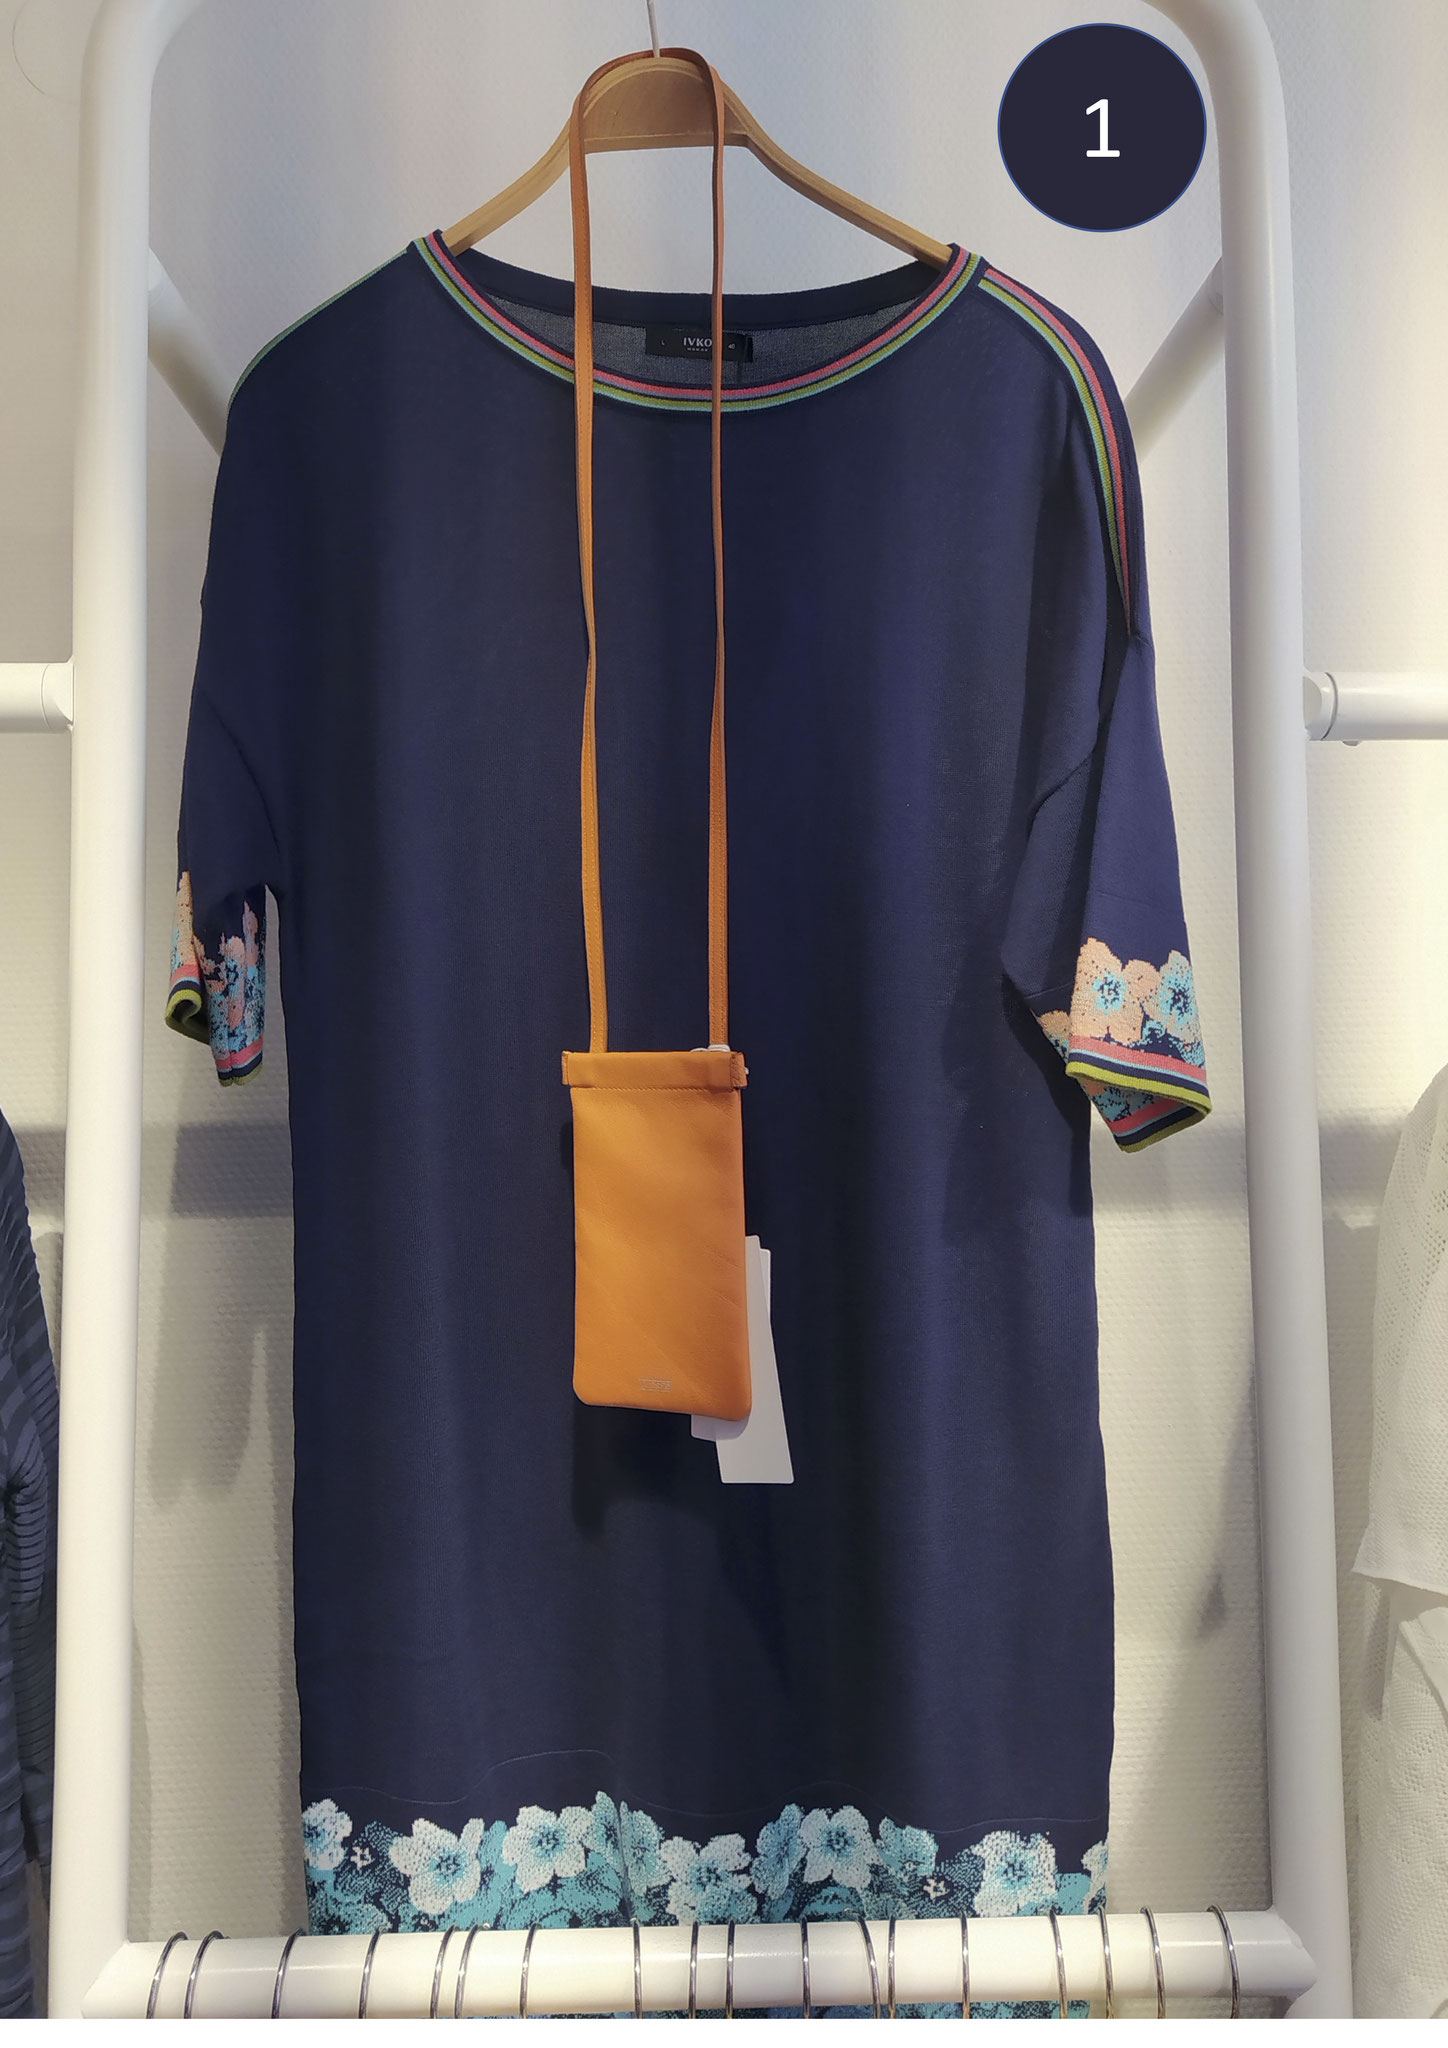 1. Kurzarm-Kleid, Baumwolle, blau mit Bordüre (149€)